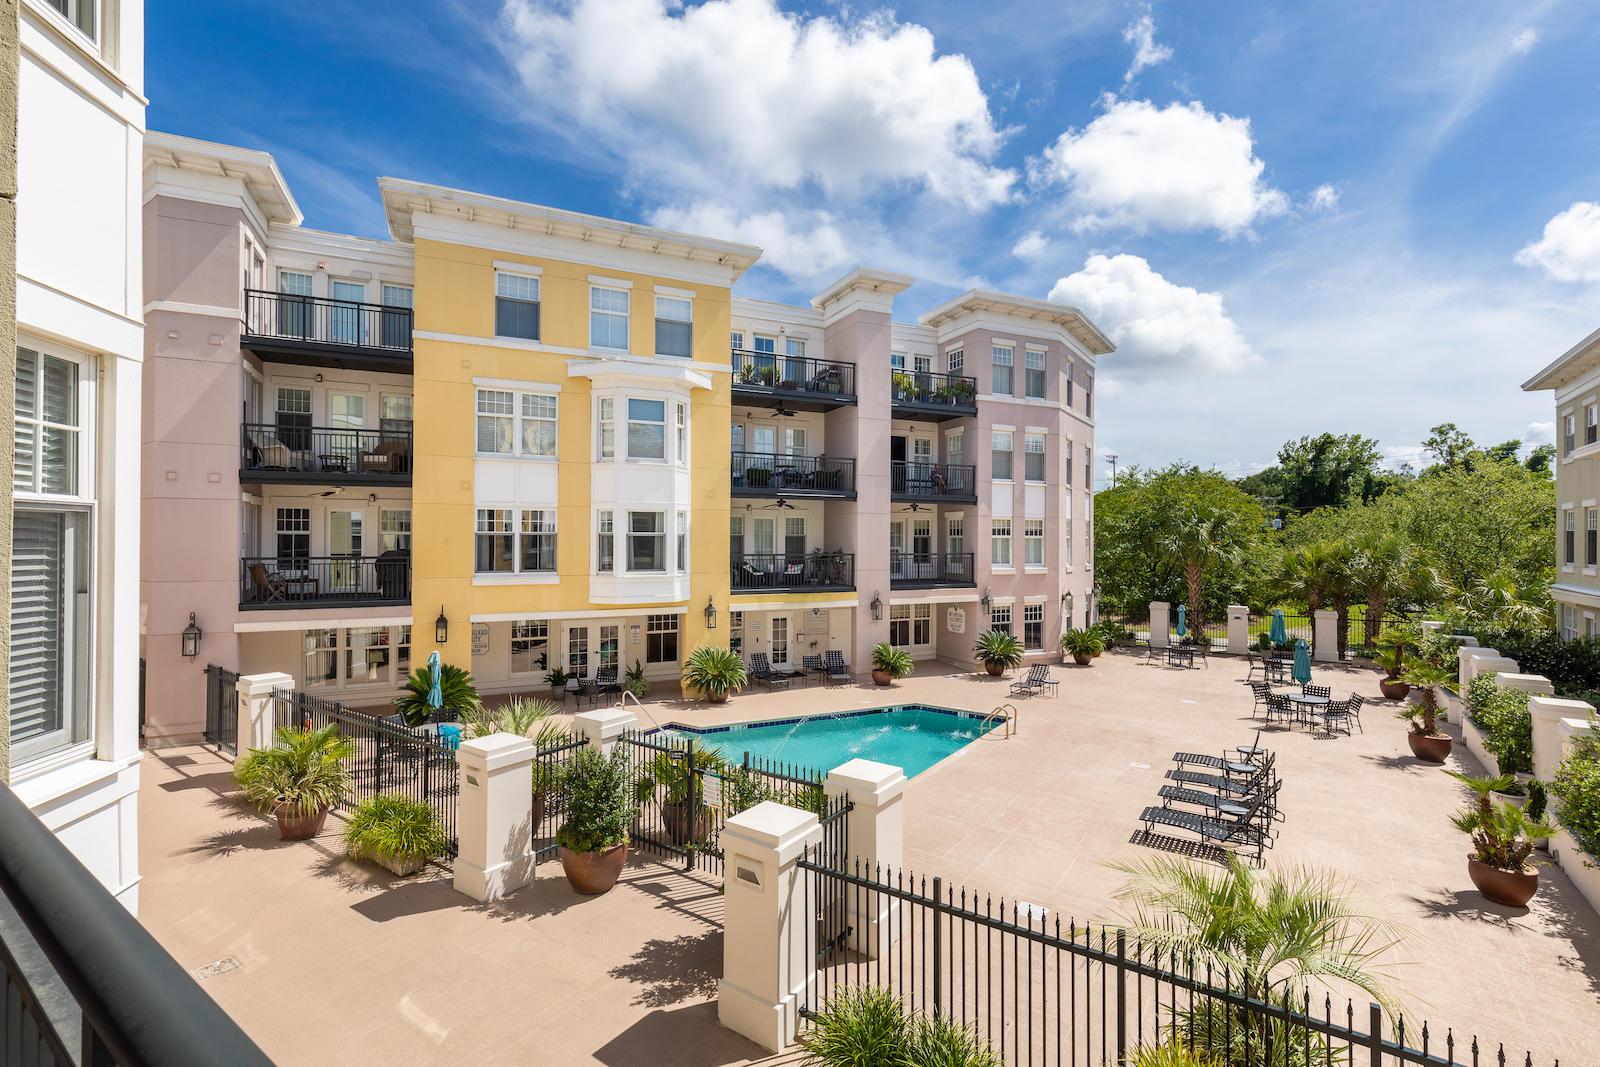 Albemarle Condos For Sale - 498 Albemarle, Charleston, SC - 16